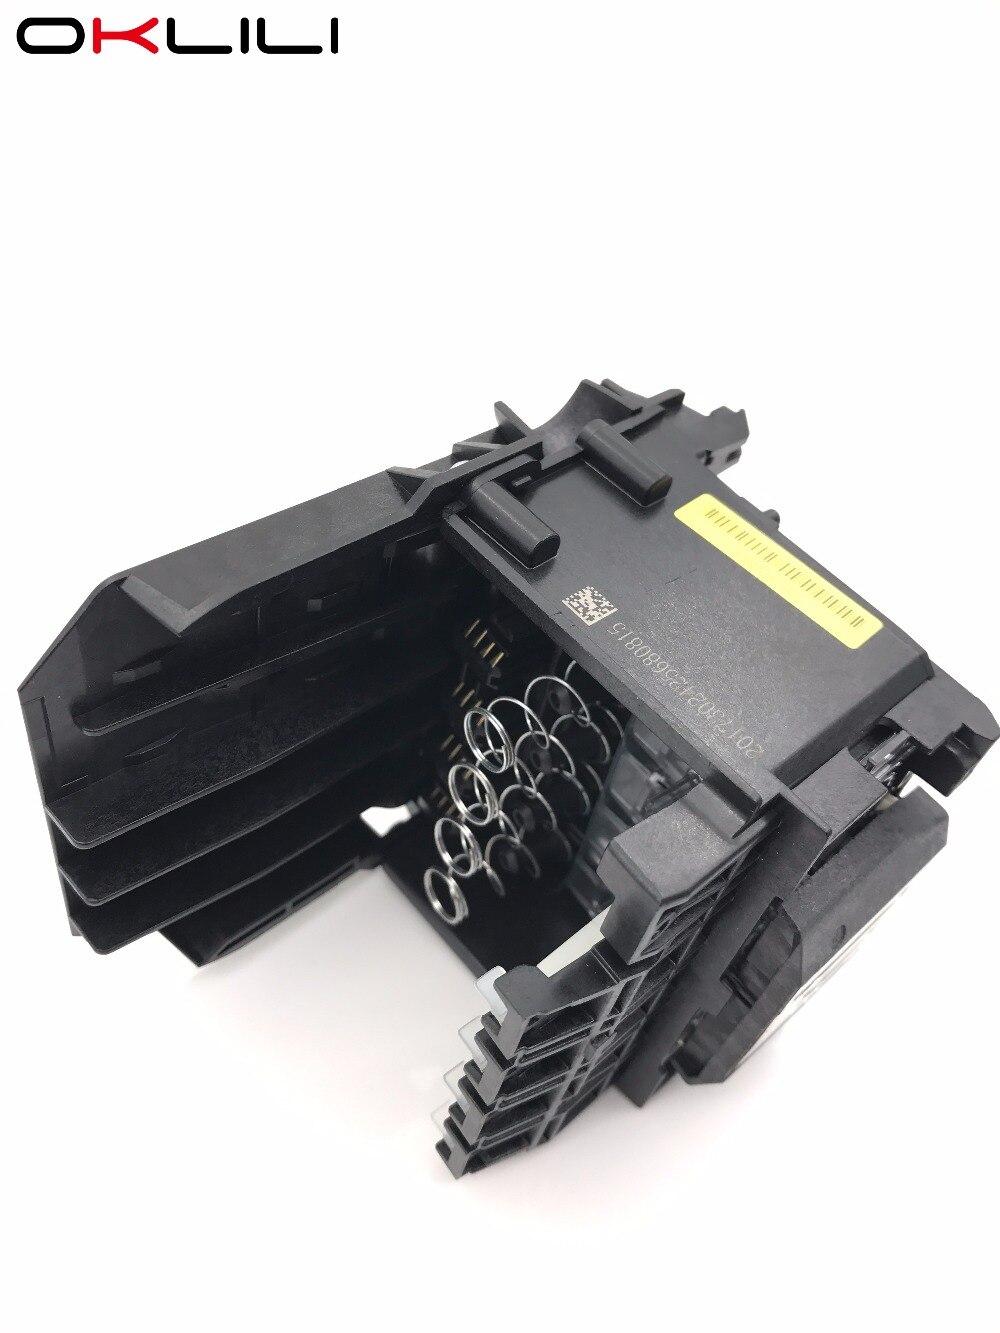 Image 2 - Печатающая головка для принтера HP 6060e 932 6100e 933 6100 6600  6700 7110 7600 7610, 932XL 933XL, 7612,print head for hpprint  headprinter print head